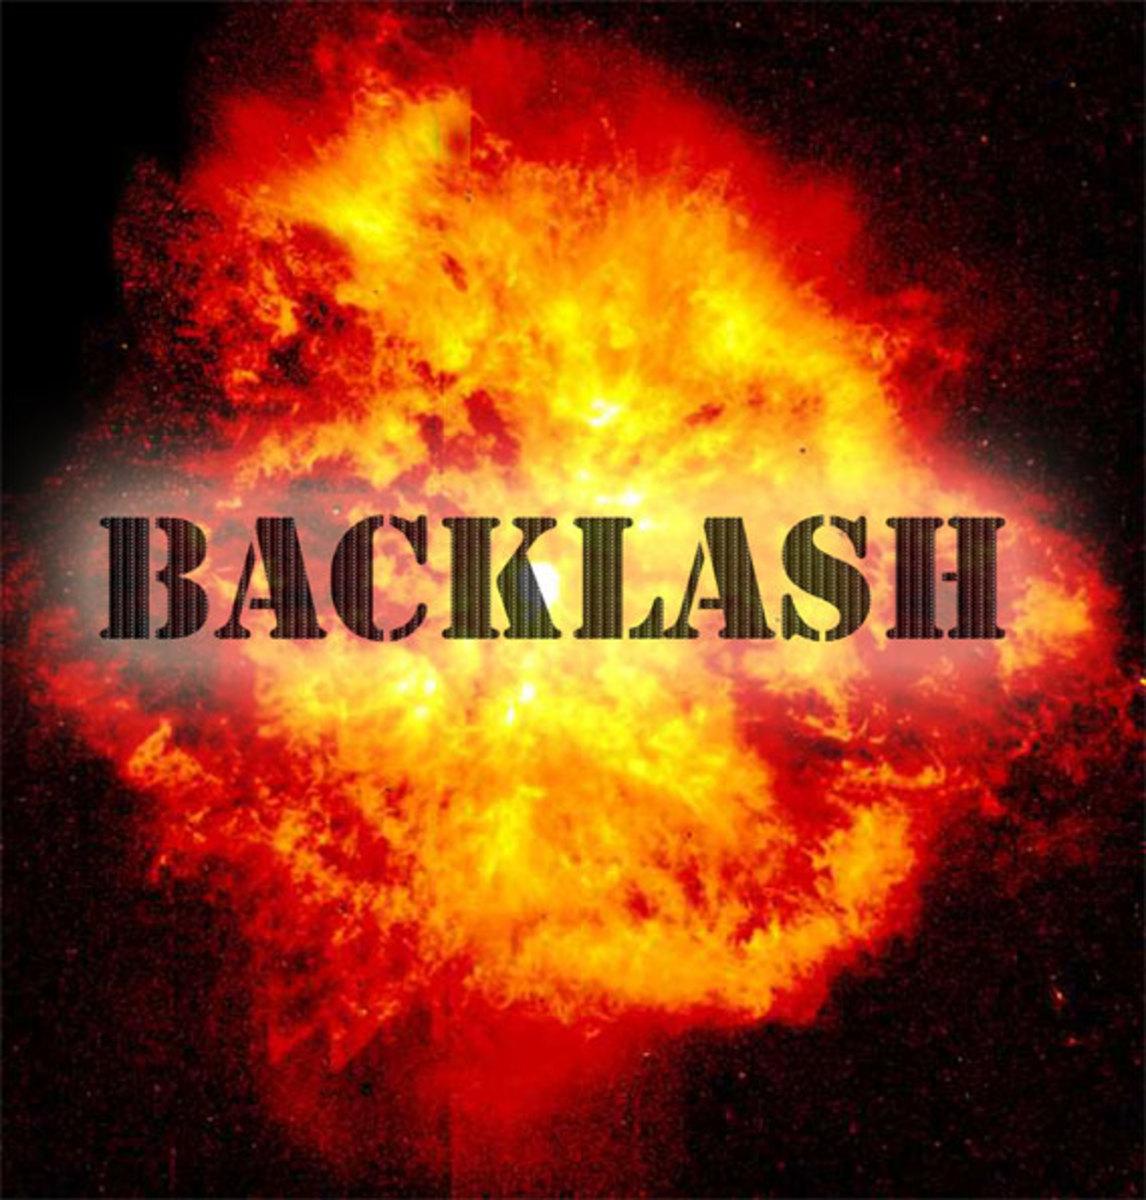 backlash victory hubpages